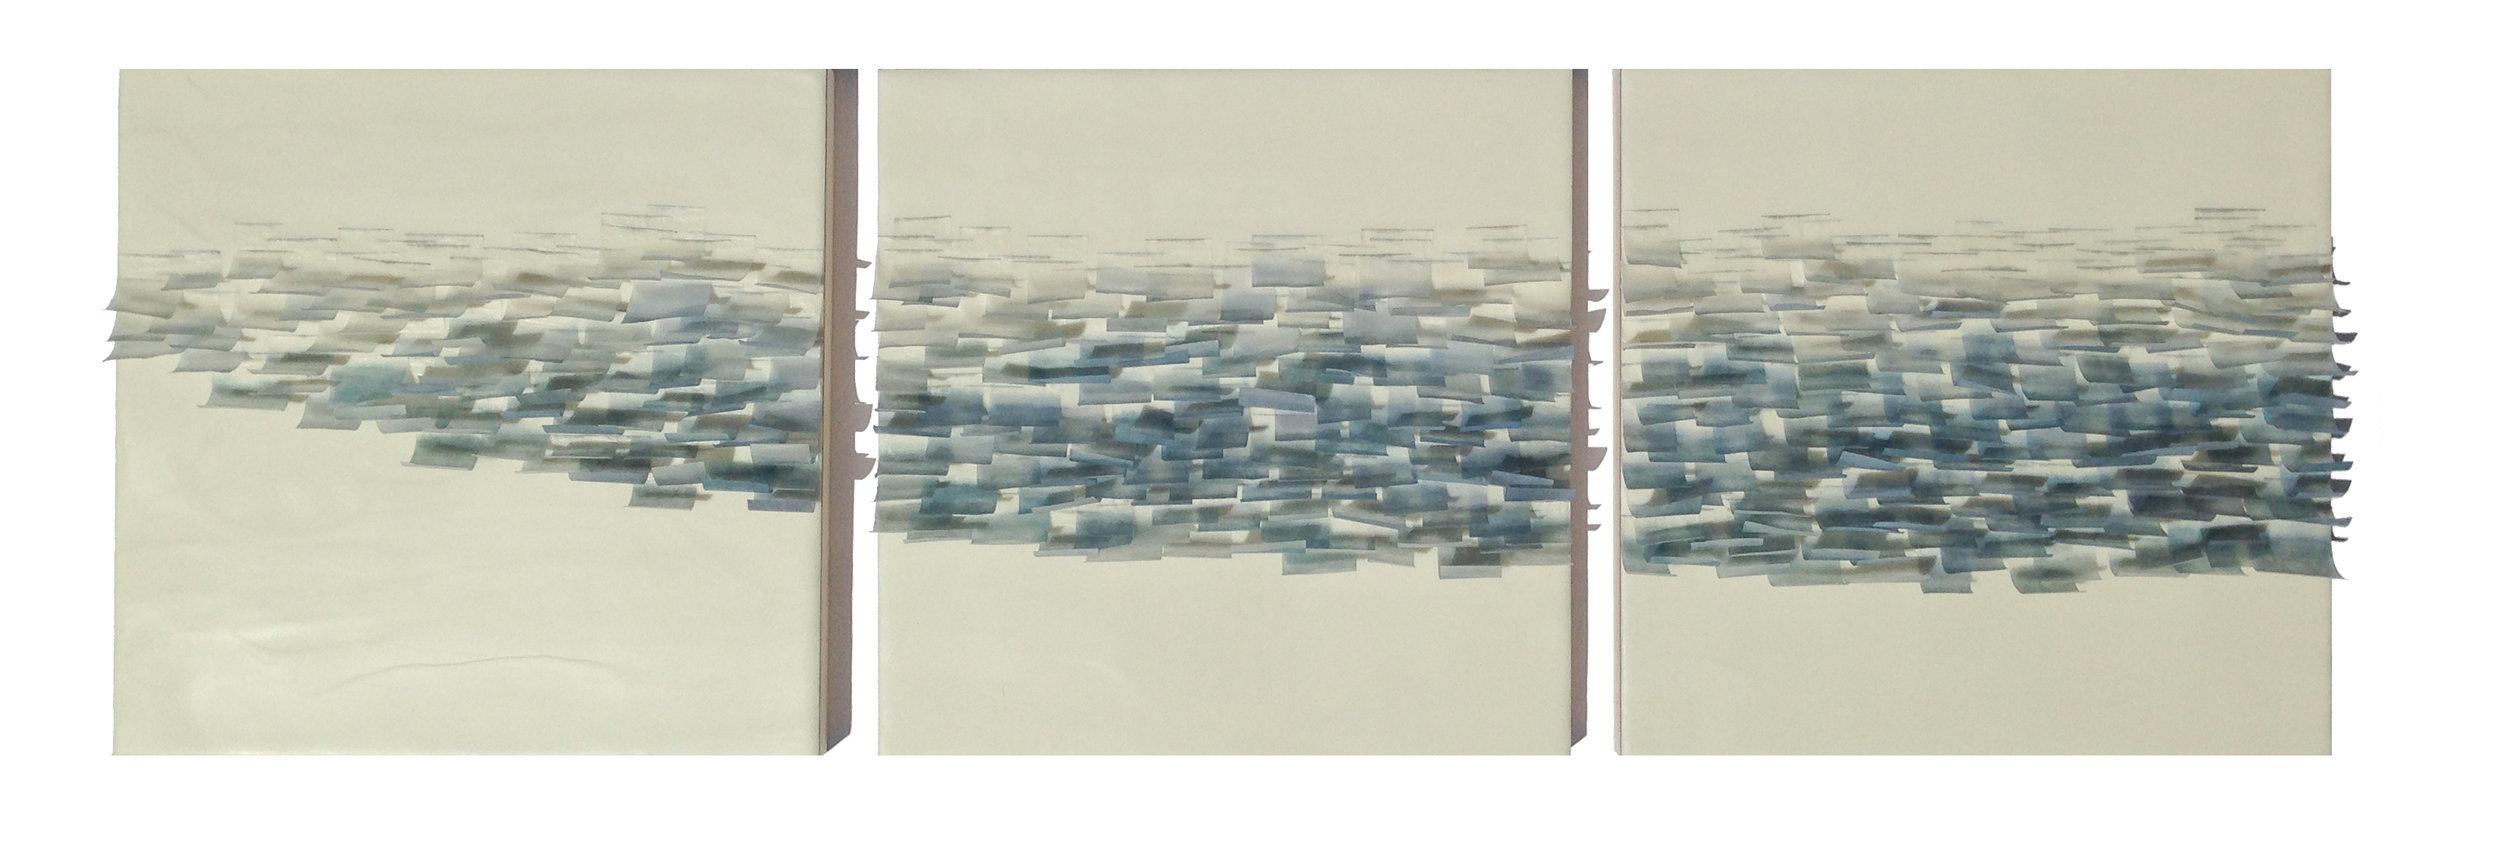 "Flutter 5, 2014 Encaustic, Mulberry Paper, Watercolor 36"" x 12""x 1"" SOLD"